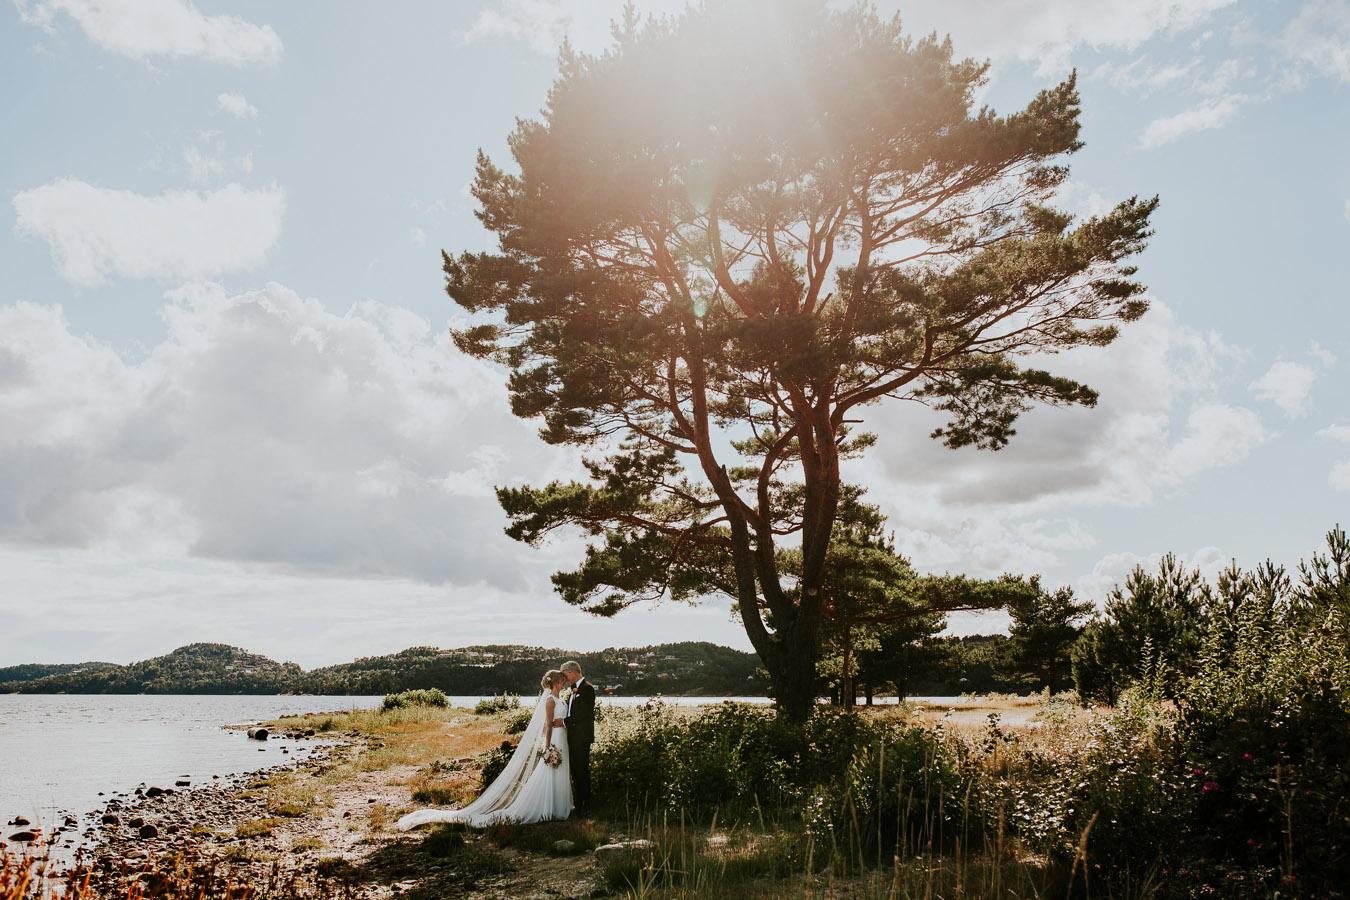 Fotograf-Tone-Tvedt-bryllup-140.jpg